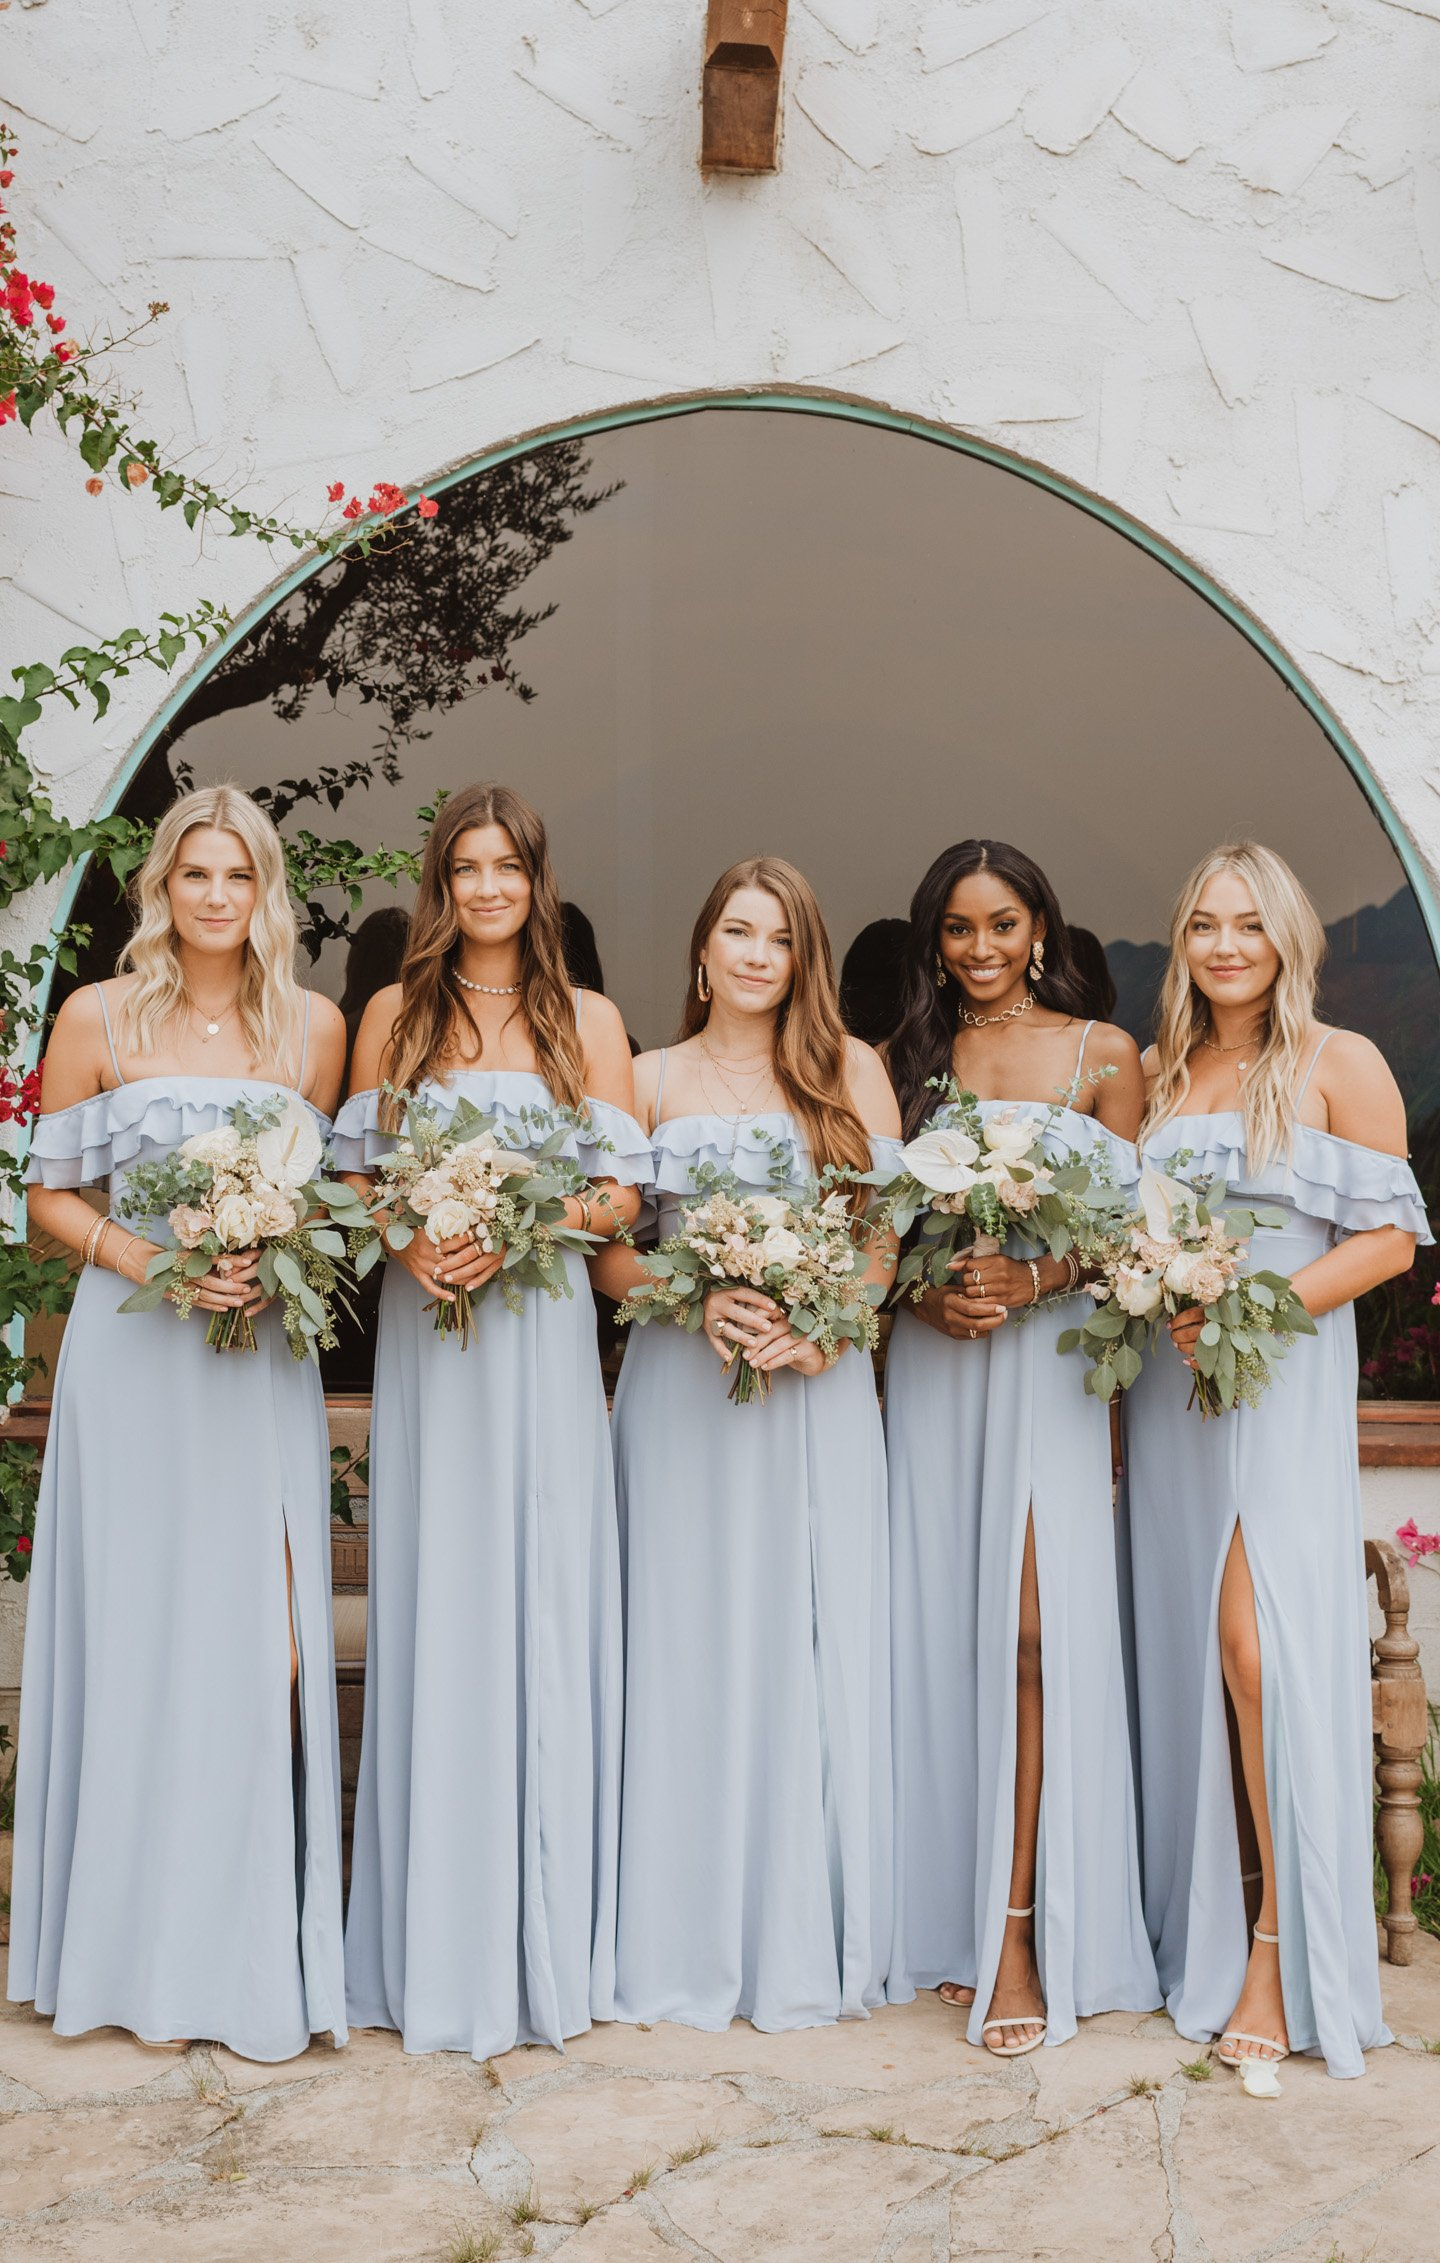 bridesmaid dresses, bridesmaid dress ideas, bridesmaid dress colors, bridesmaid dress styles, blue bridesmaid dress, maxi bridesmaid dresses